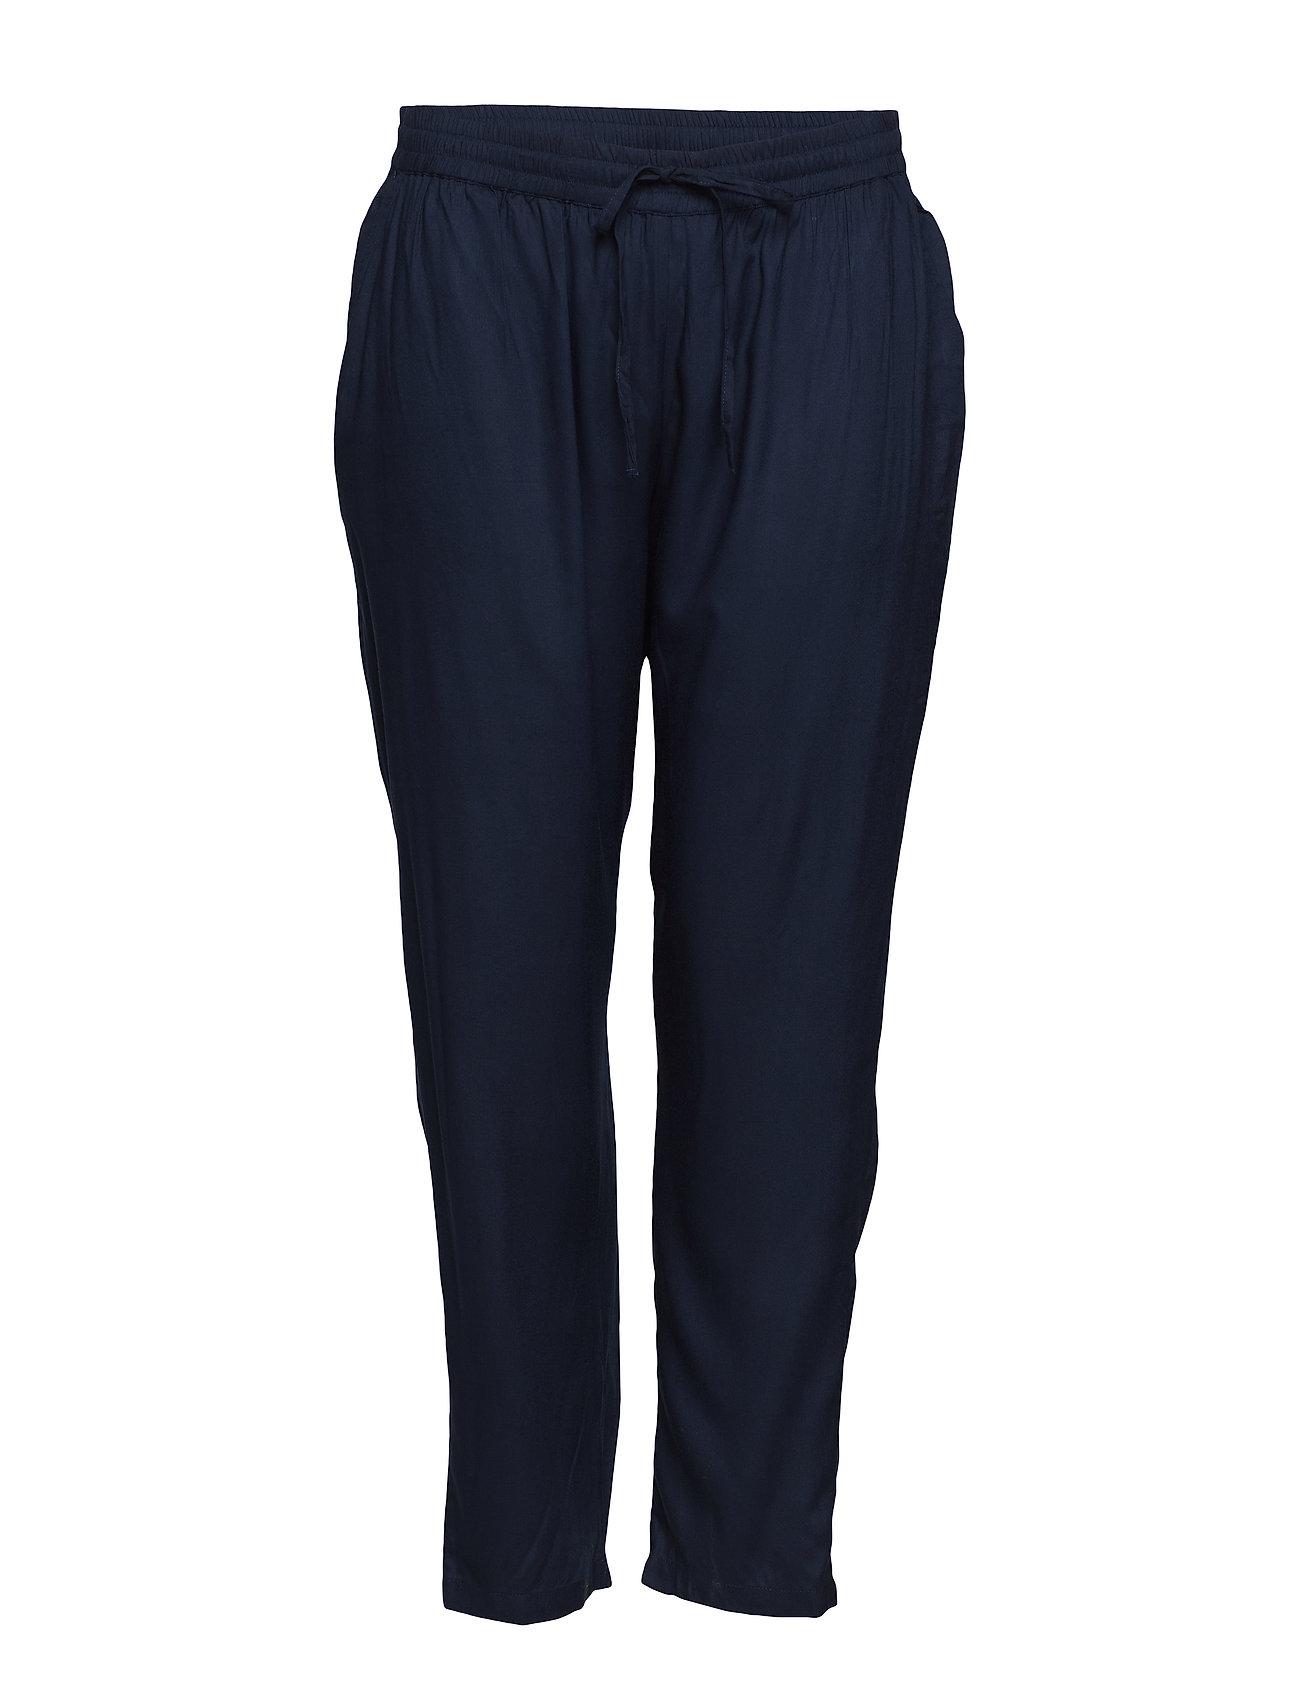 Image of Jrmaika Pants - K Mh Bukser Med Lige Ben Blå JunaRose (3374724593)